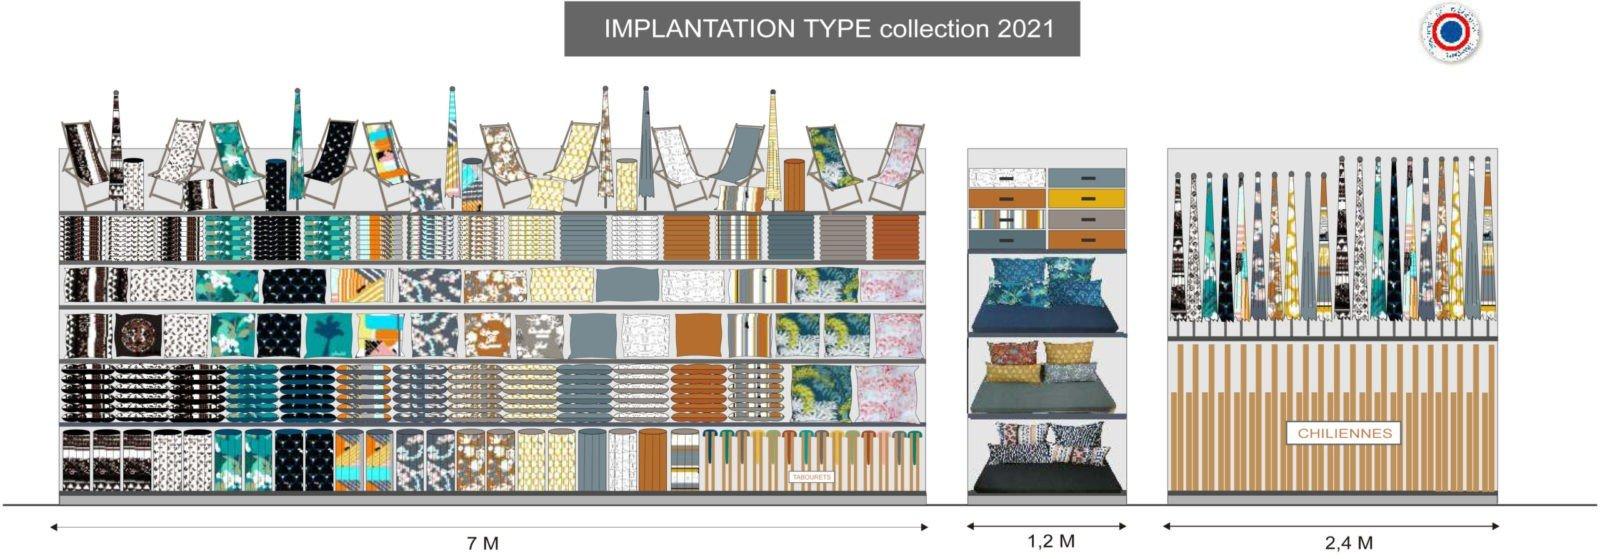 IMPLANTATION NP CREATIONS 2021 XL .cdr